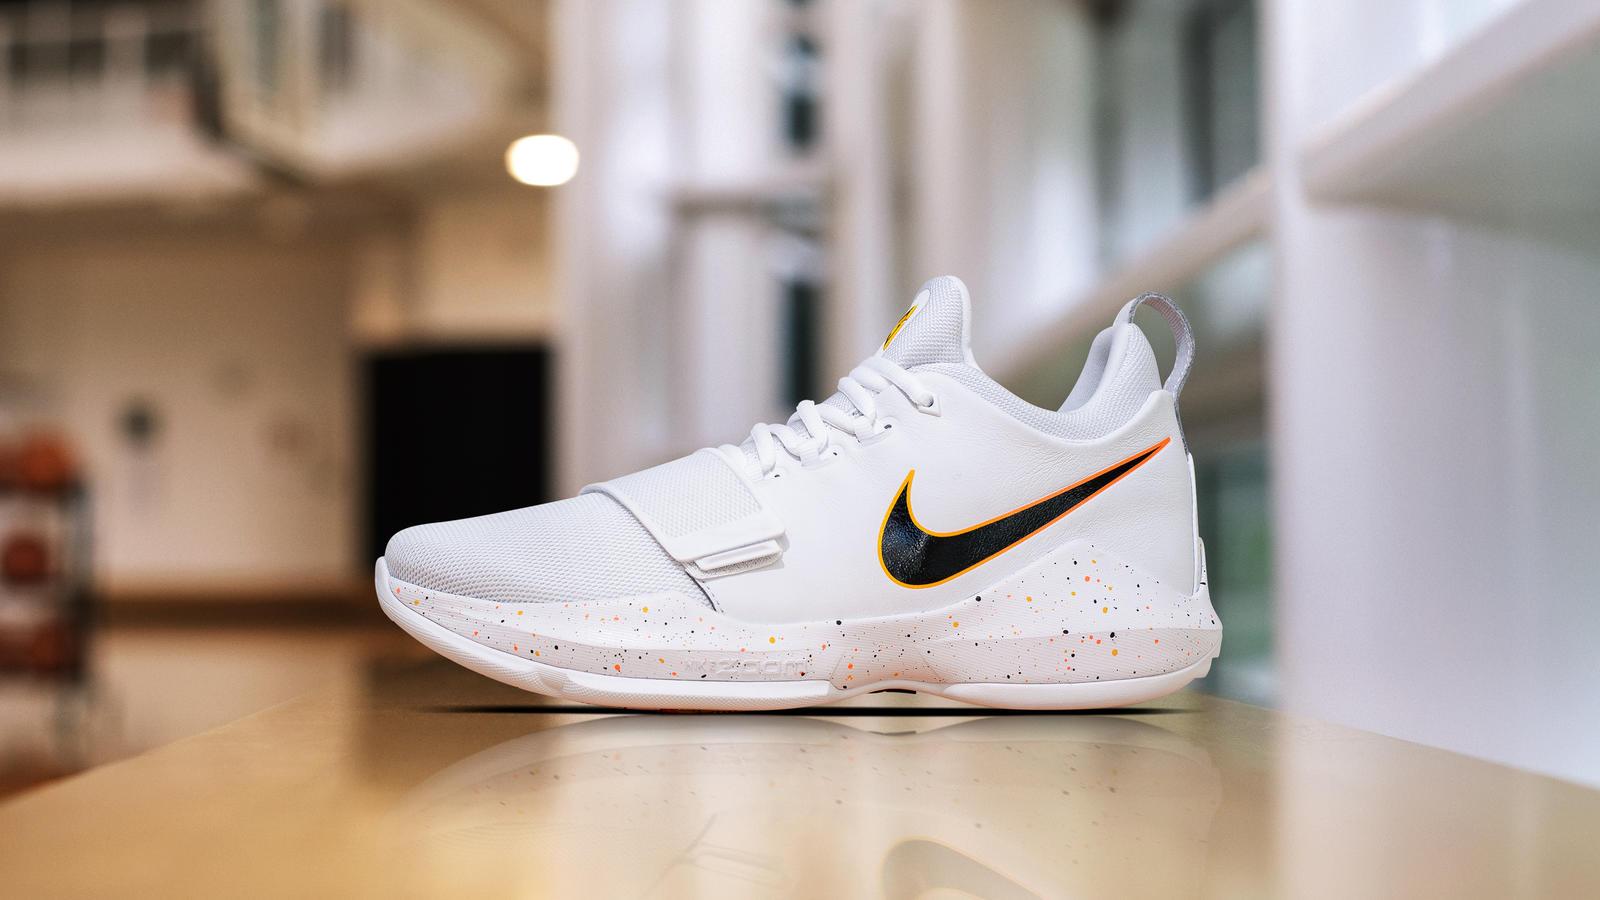 Nike's PG1 PE Paul George shoe